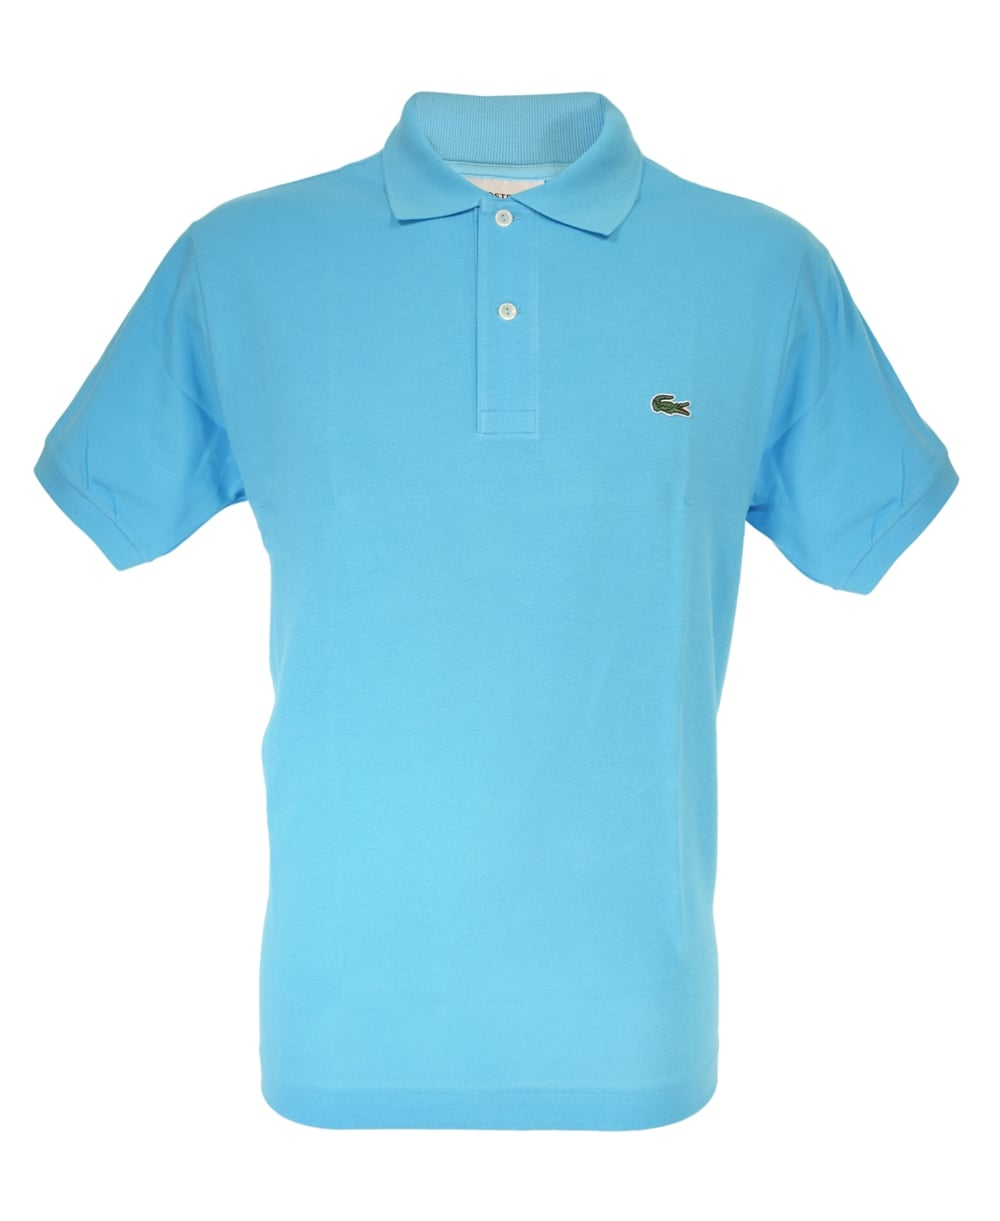 Light Blue Classic Fit Polo Shirt